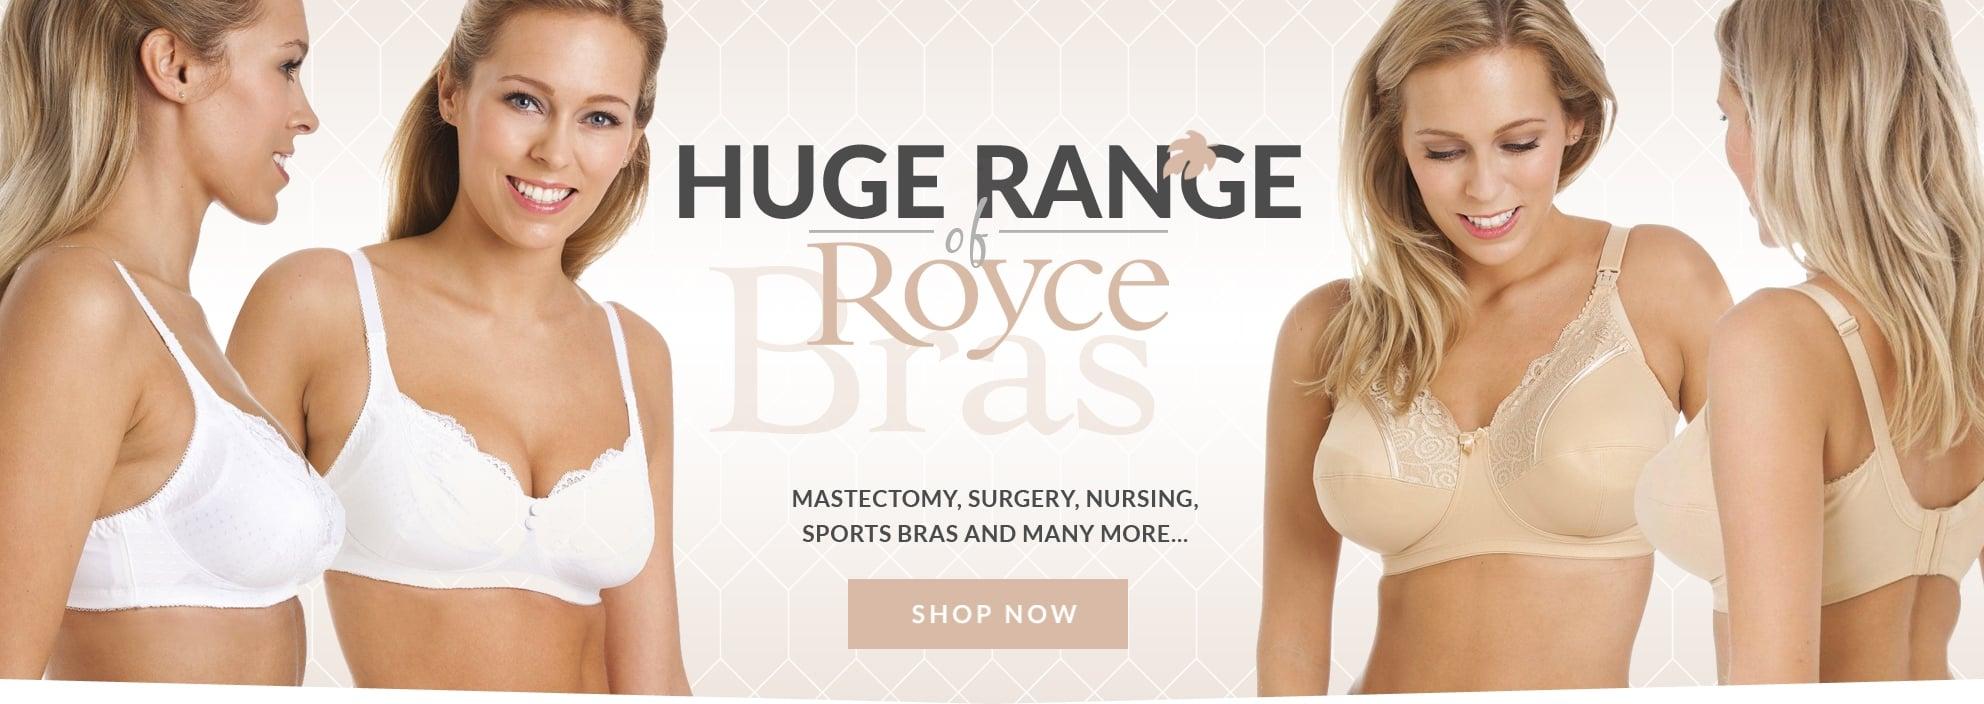 Royce Promo